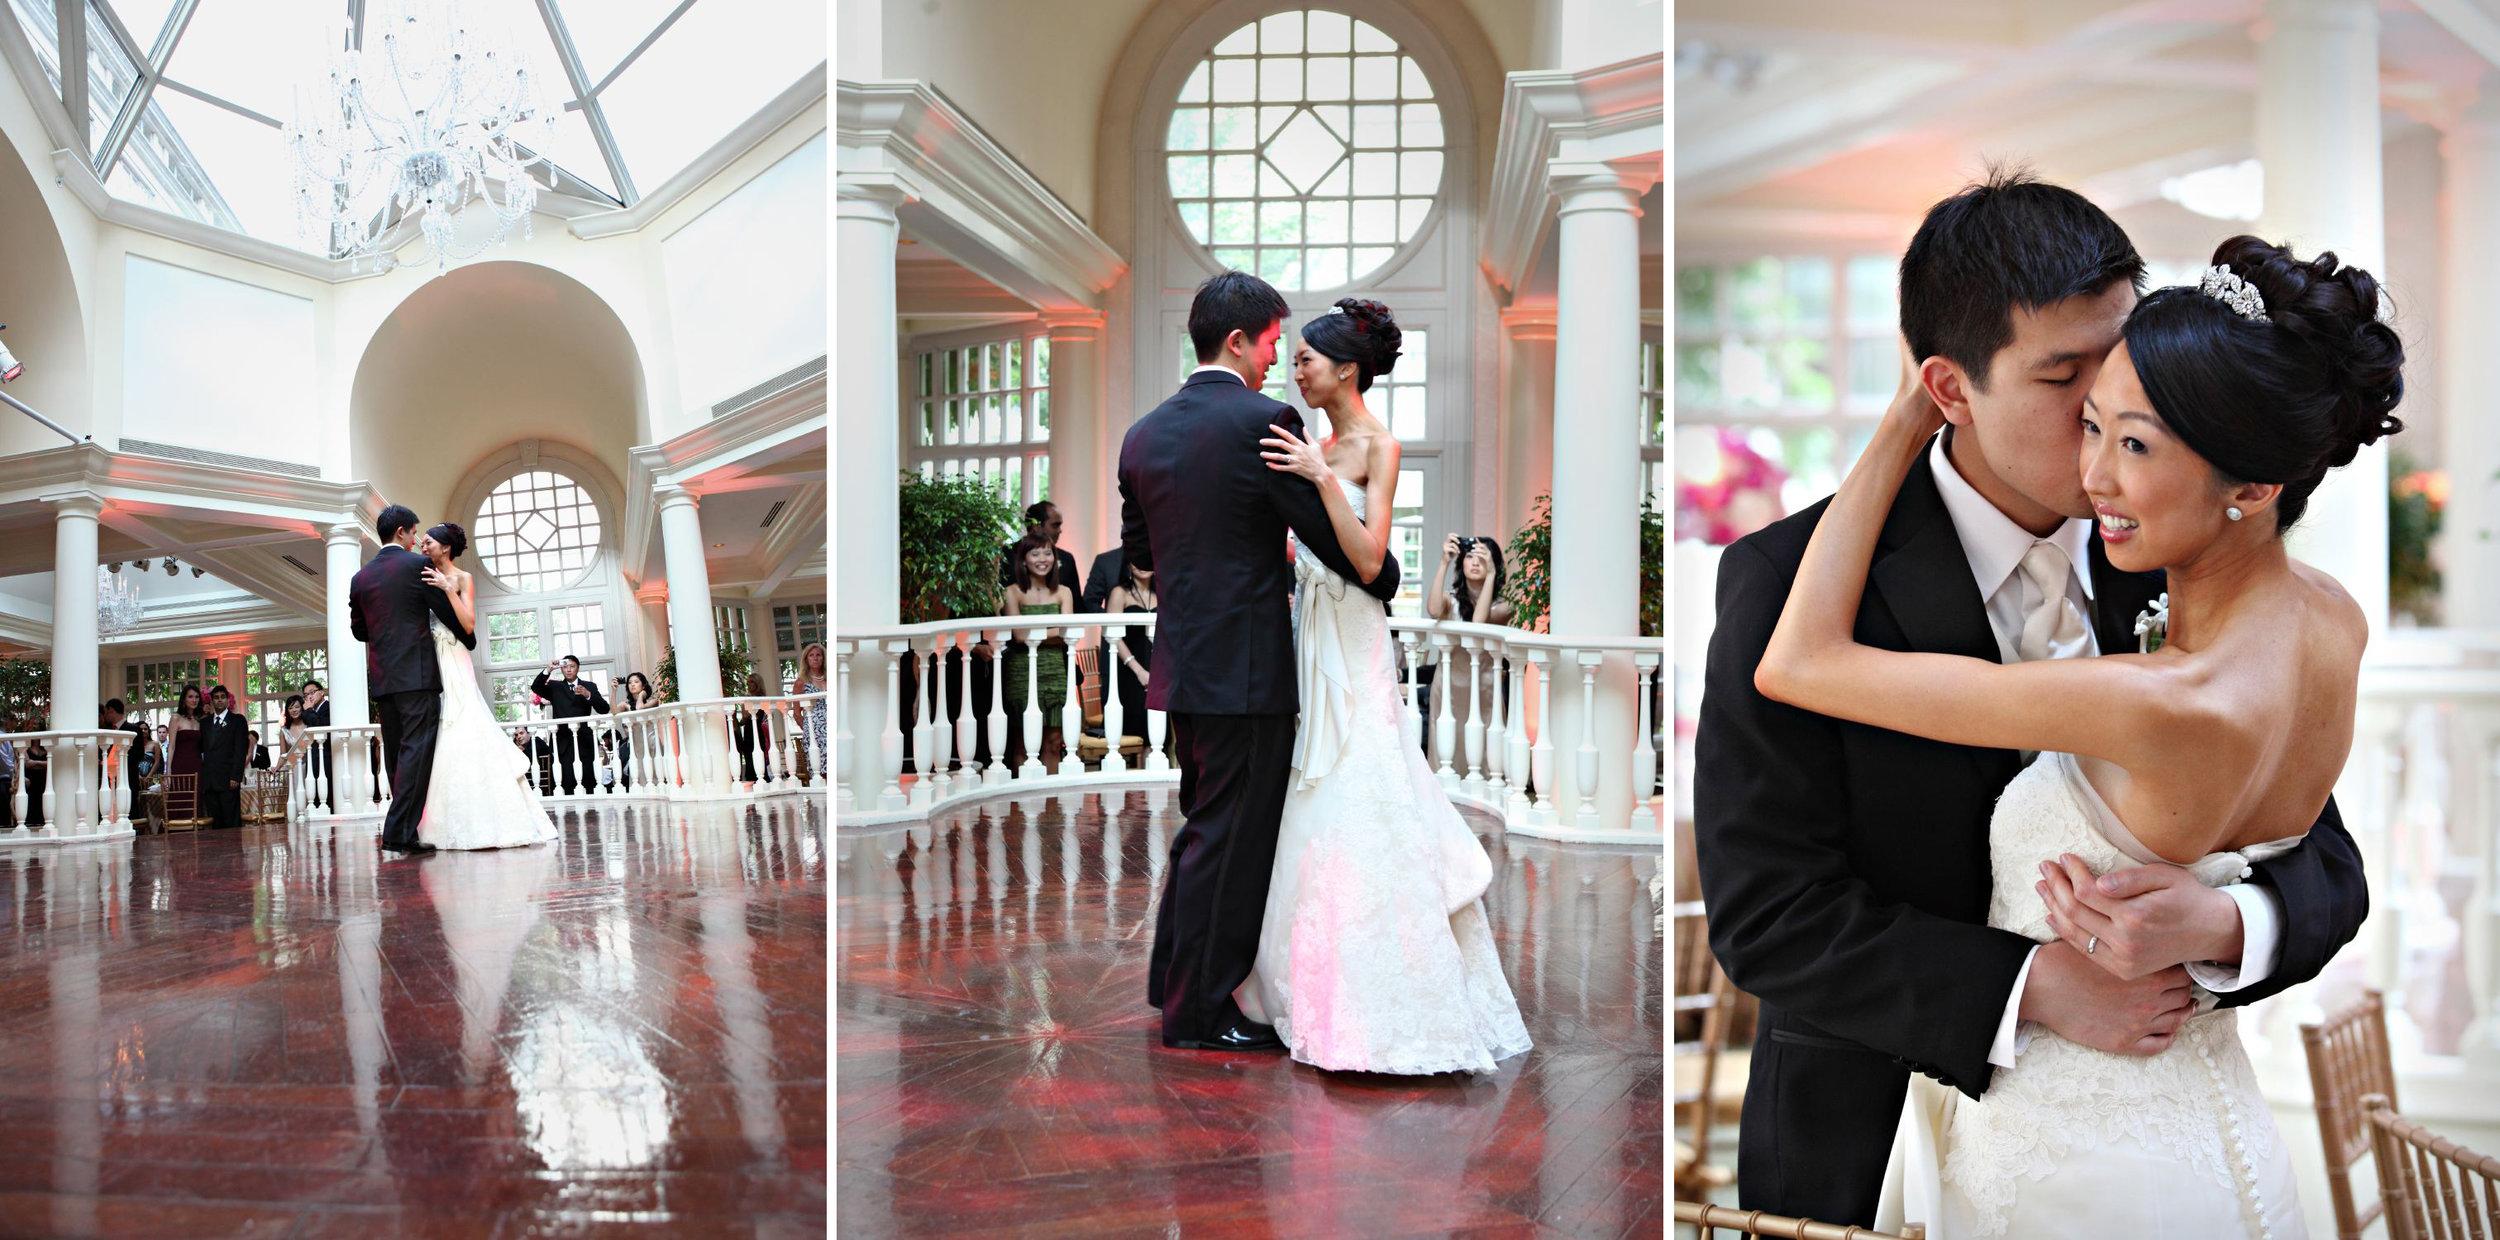 Weddings - 07 Reception 0002.JPG